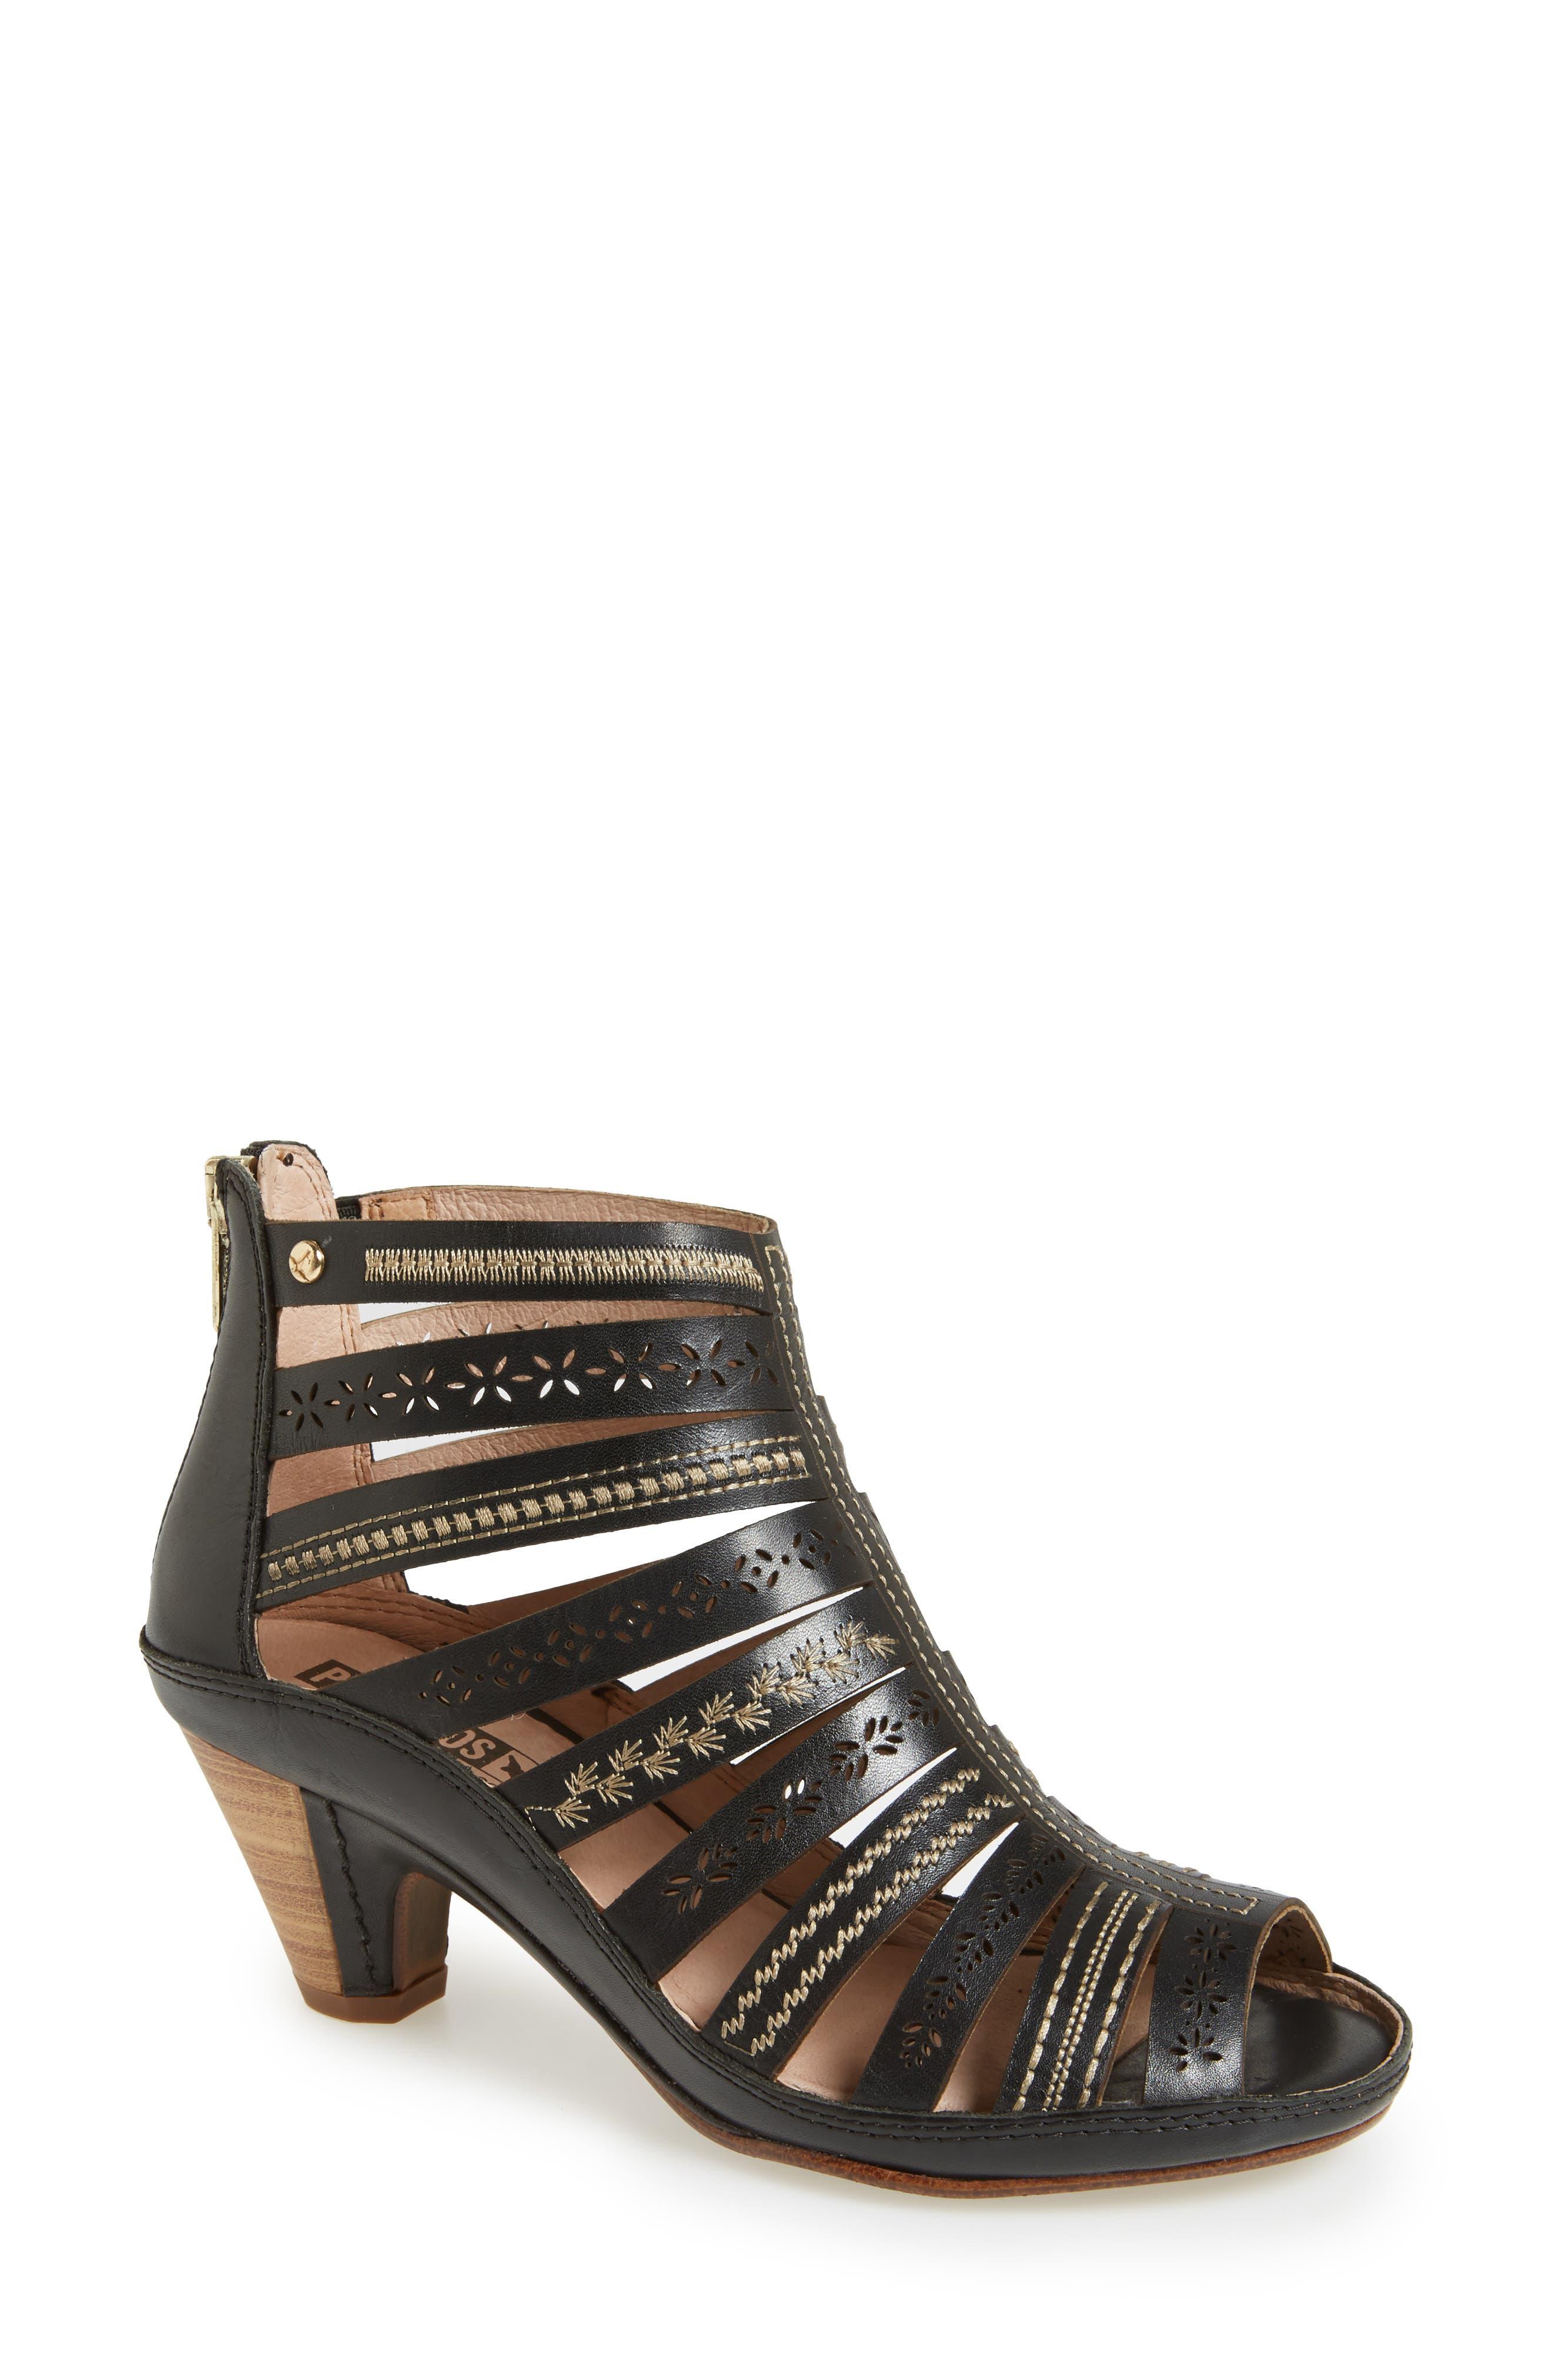 Main Image - PIKOLINOS 'Java' Leather Gladiator Sandal (Women)